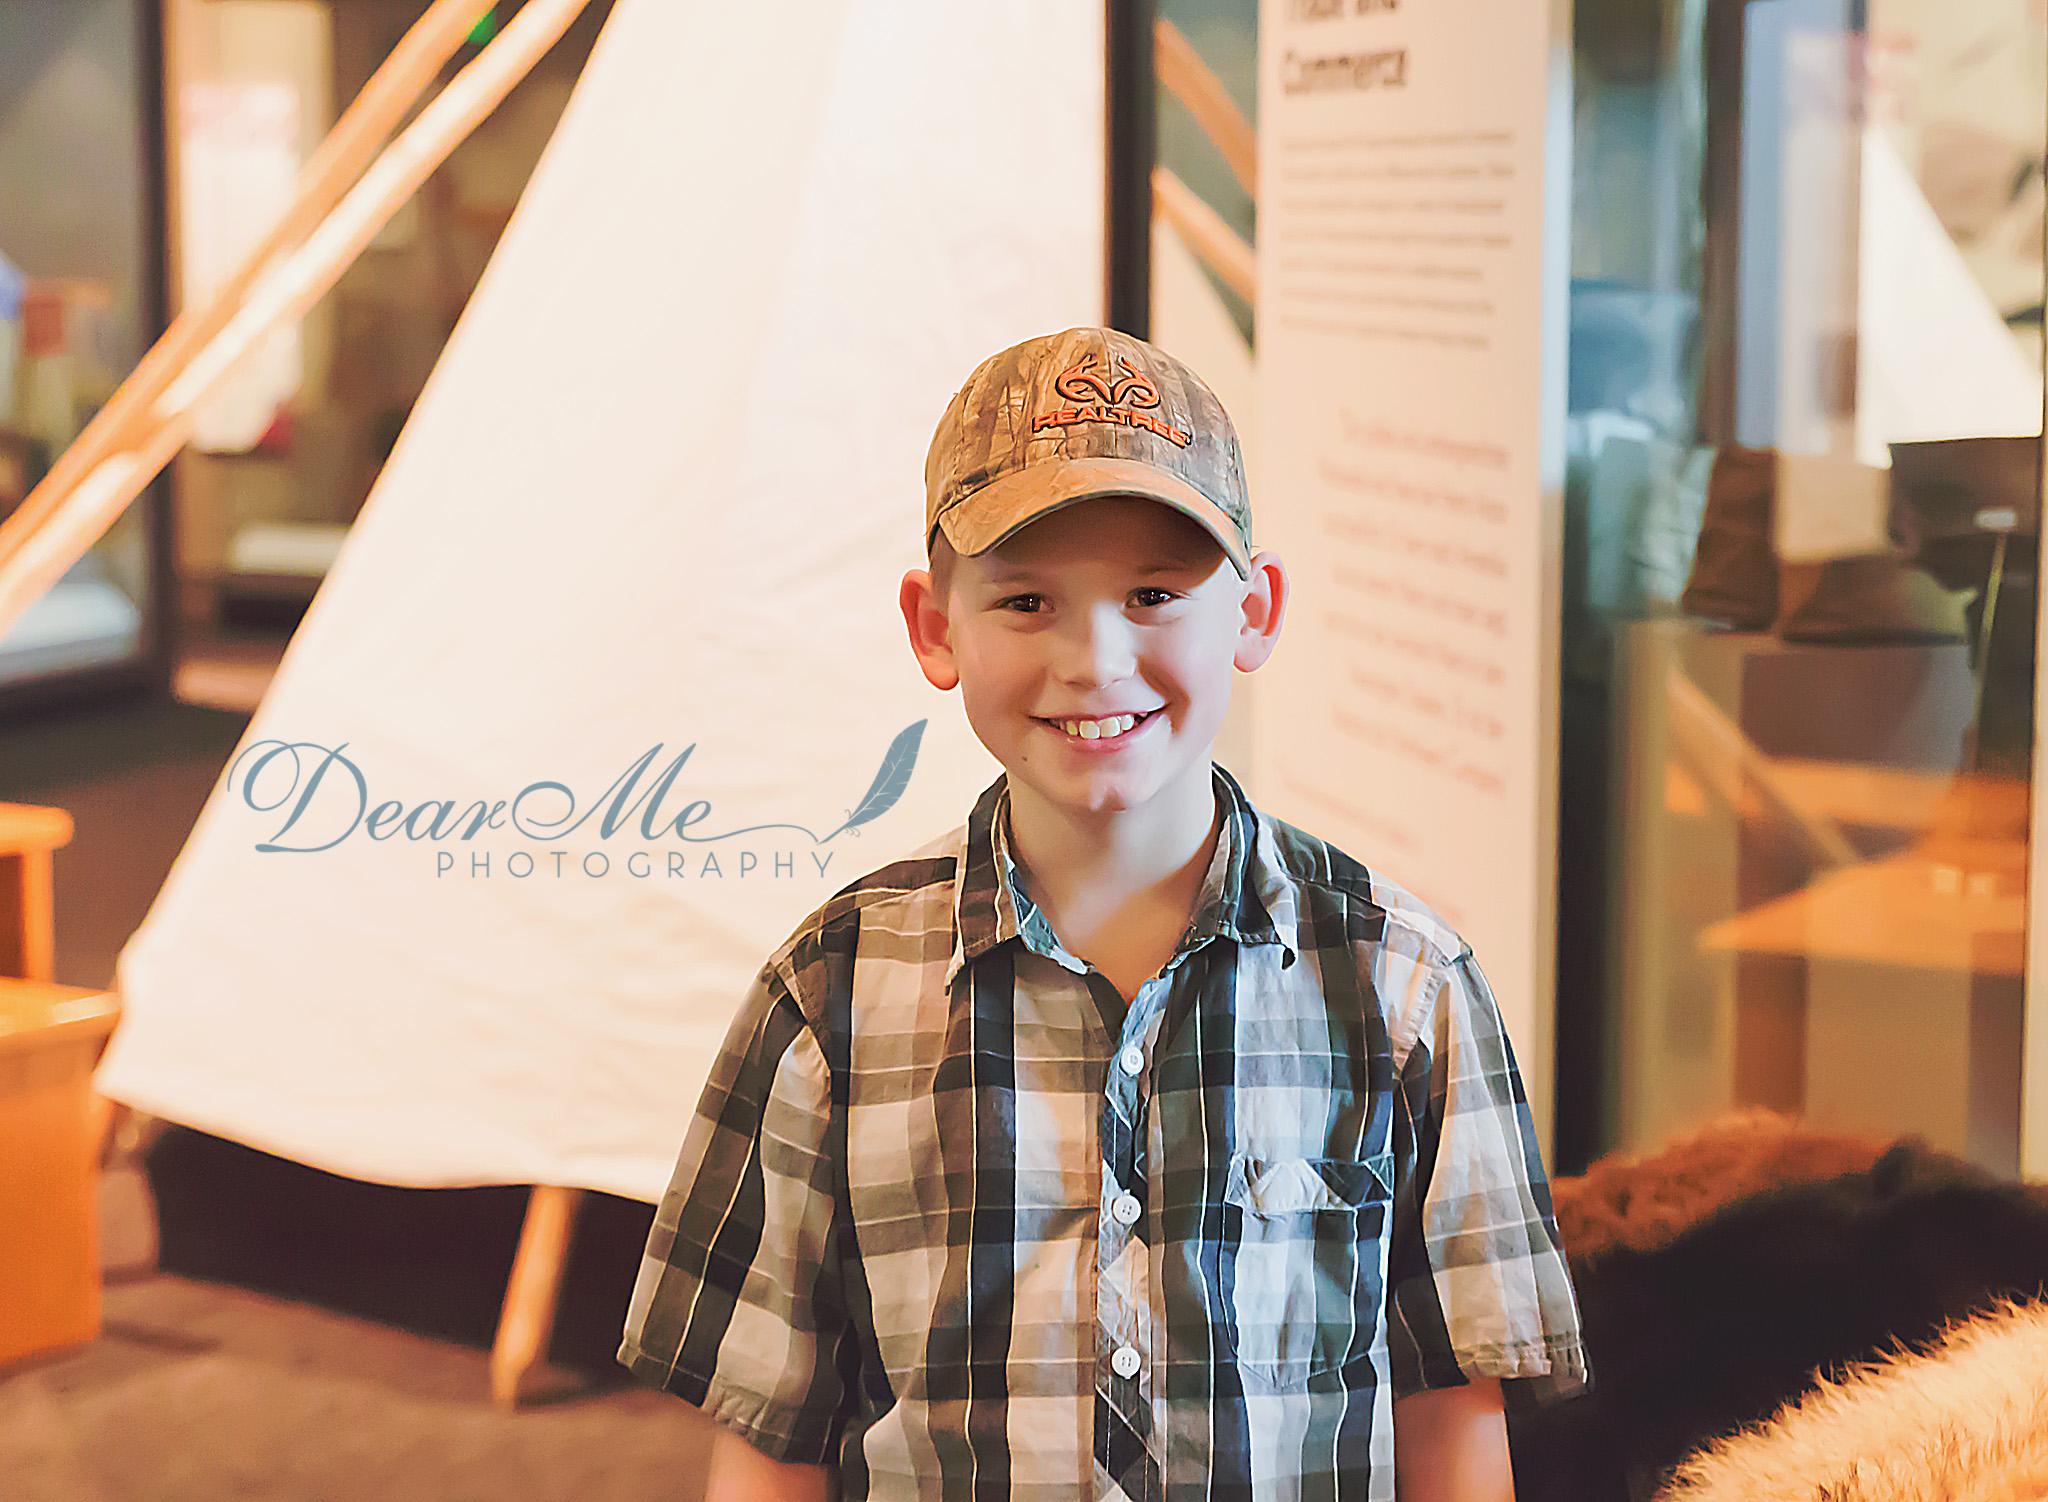 dear me photography bismarck faces of autism boy wearing baseball cap